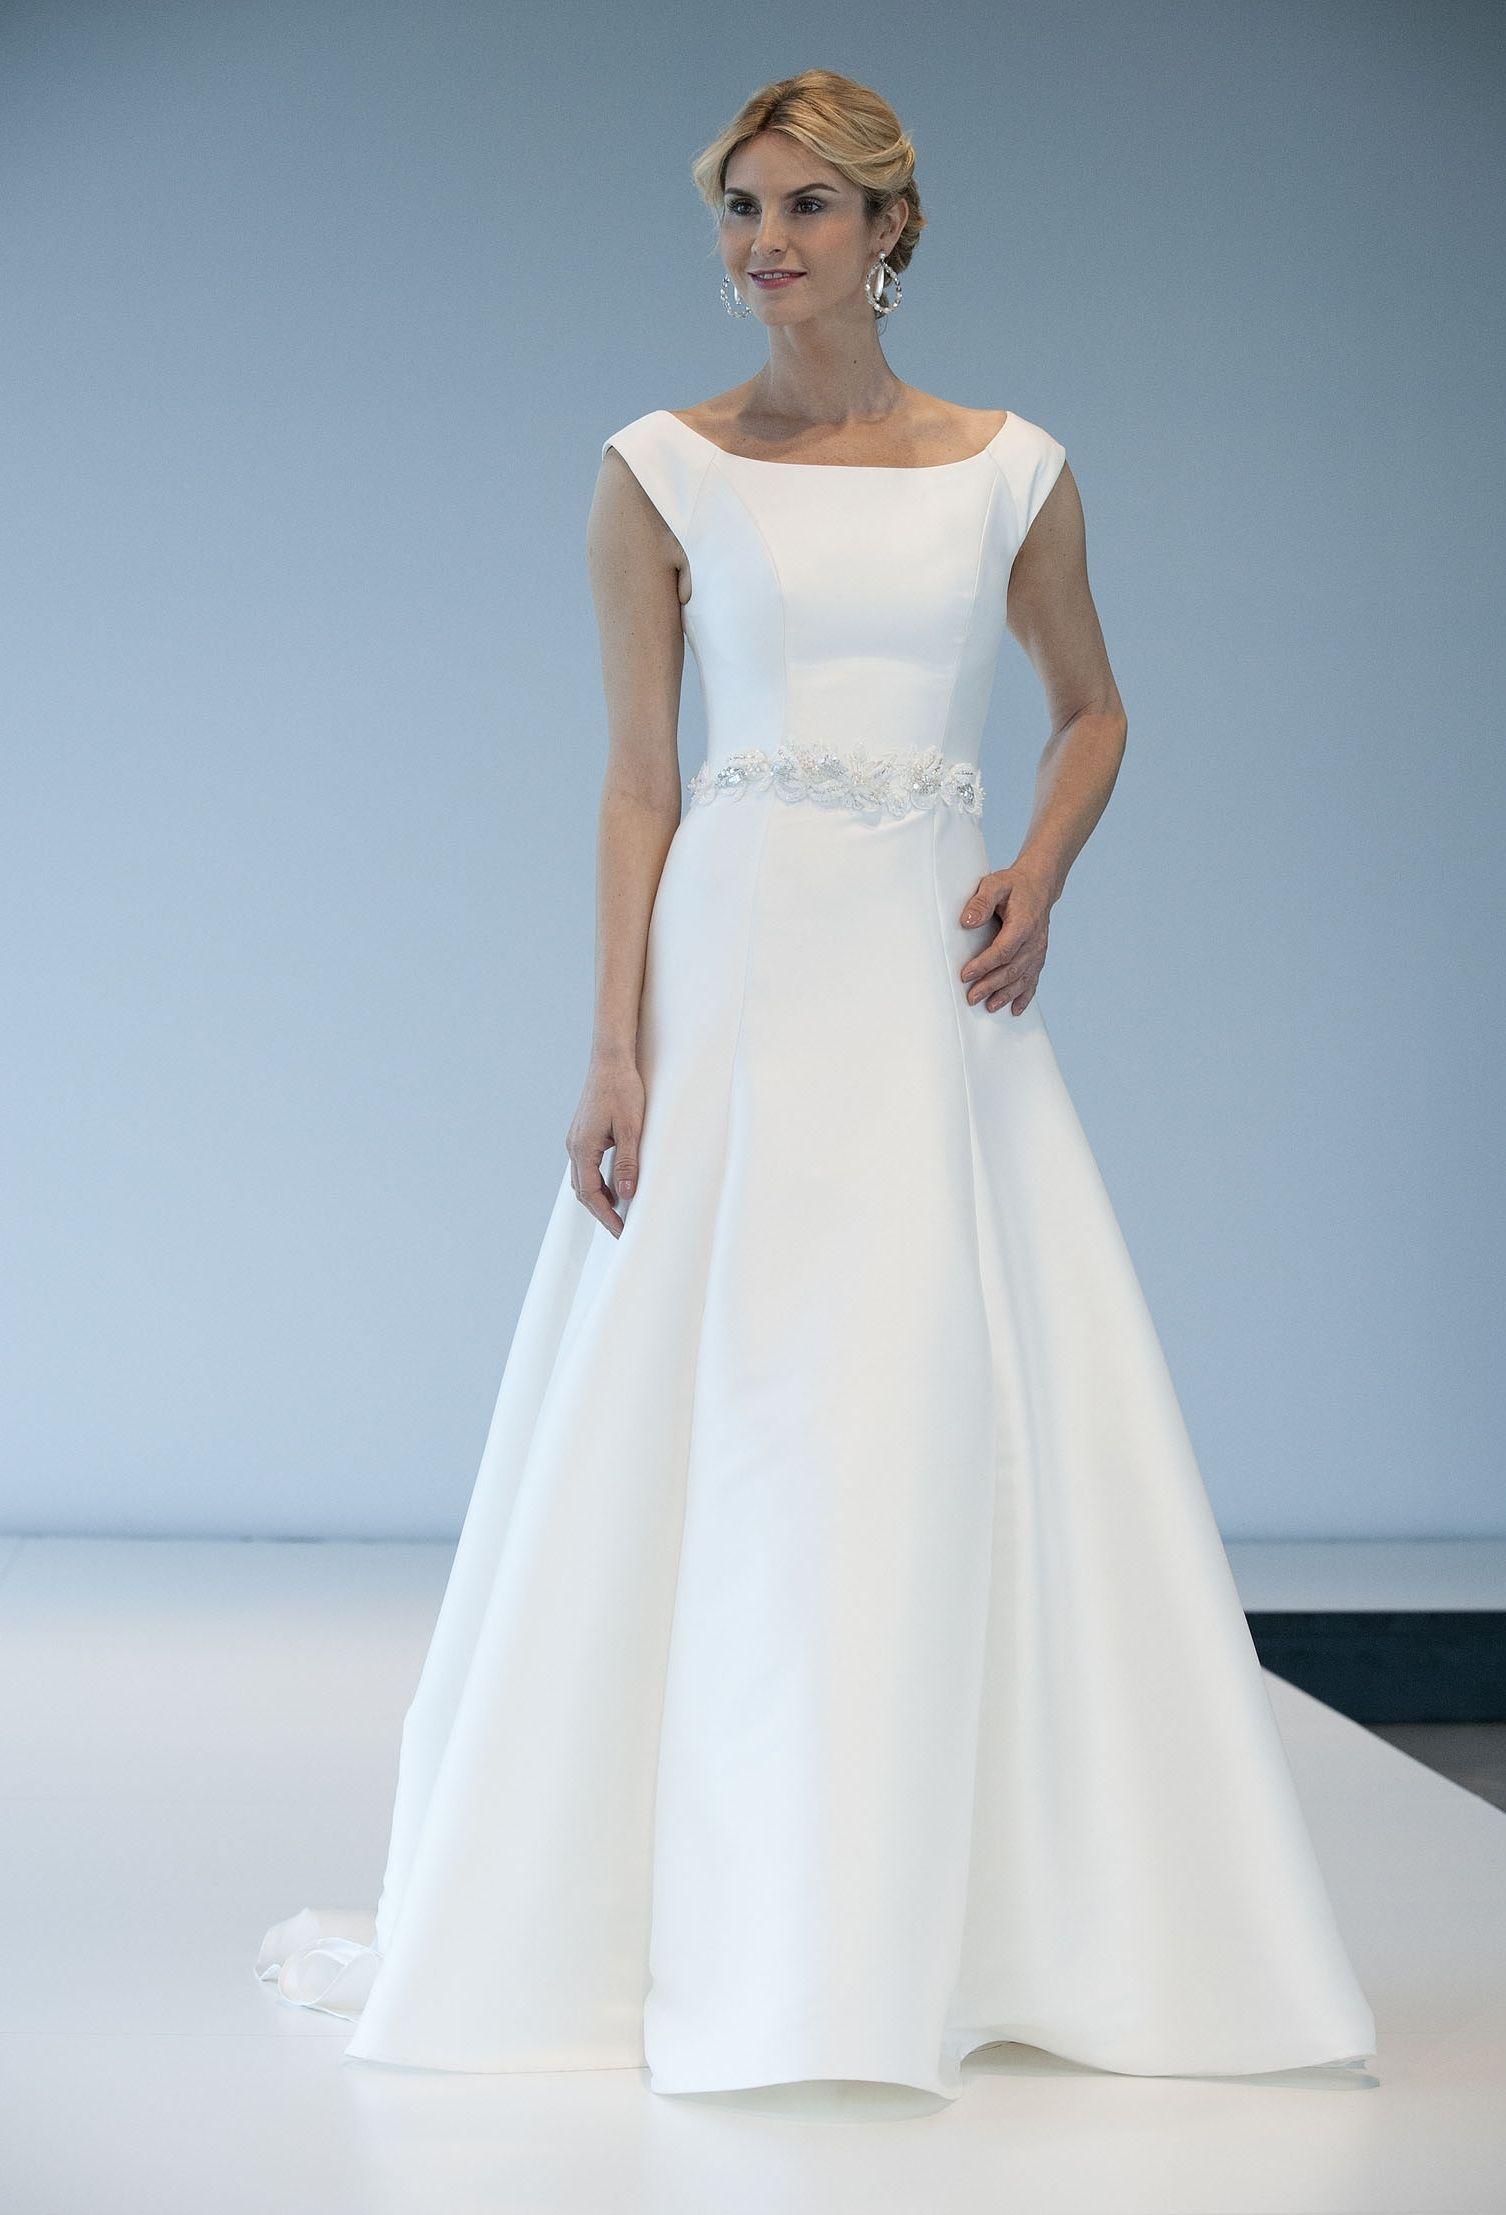 Wedding Dresses Denver - Wedding Ideas